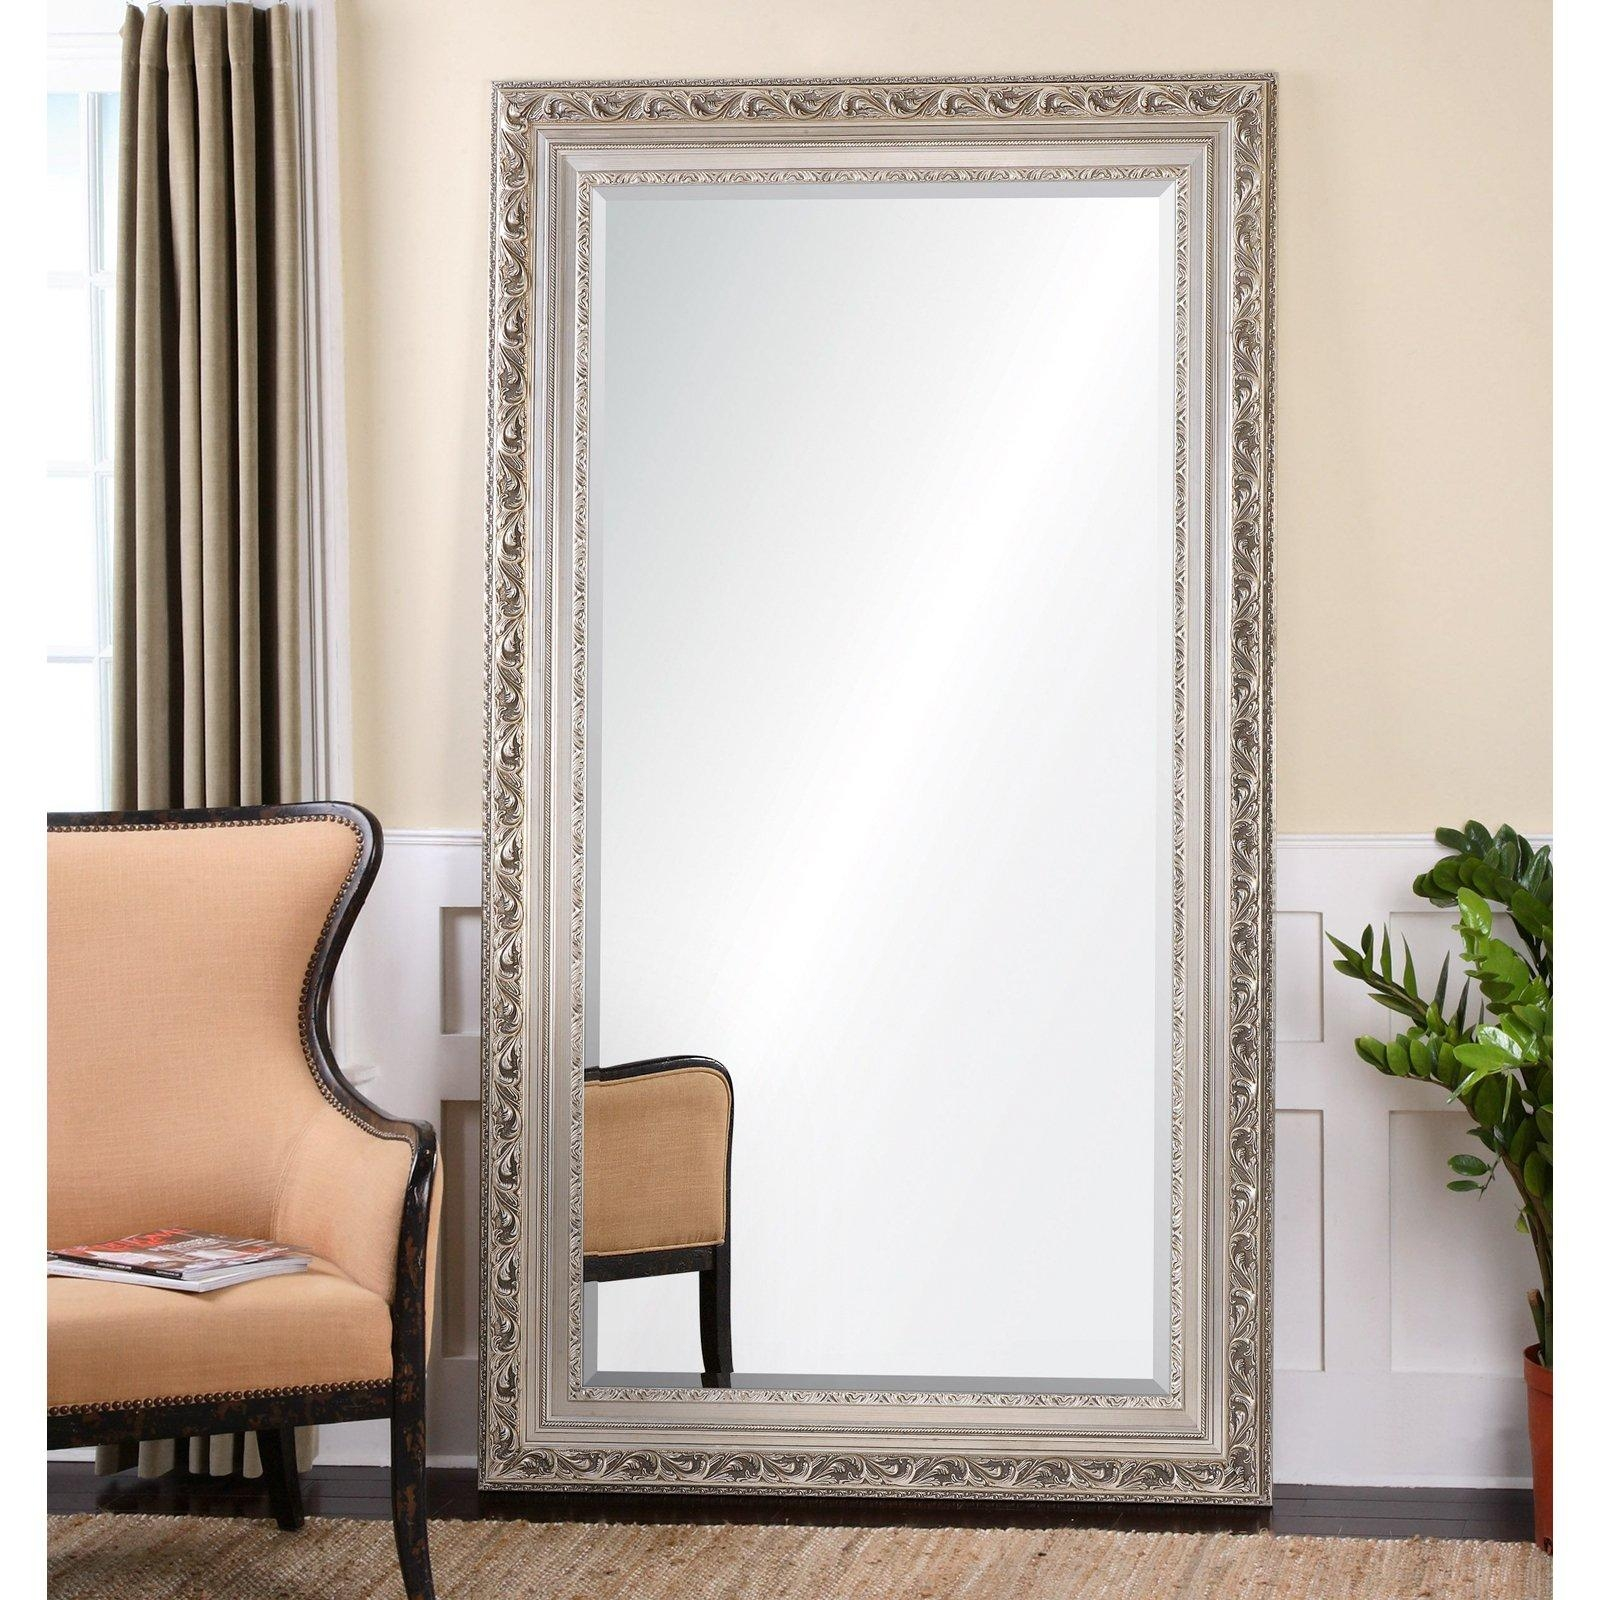 Furniture: Mesmerizing Oversized Floor Mirror For Home Furniture Inside Oversized Antique Mirror (Image 16 of 20)